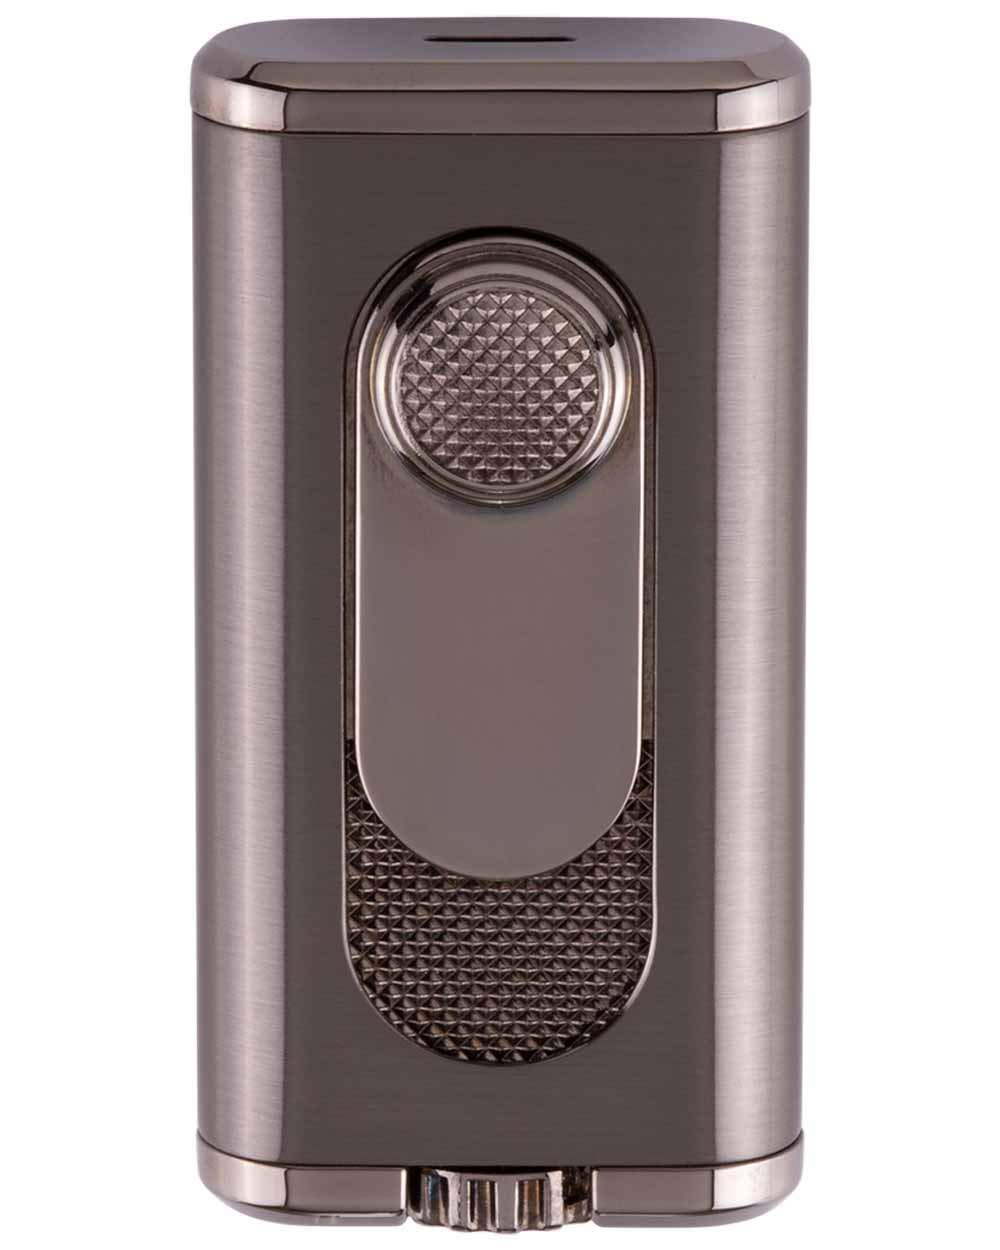 Amazon.com: Verano Flat Flame Cigar Lighter in an Attractive Gift Box Lifetime Warranty Silver: Health & Personal Care